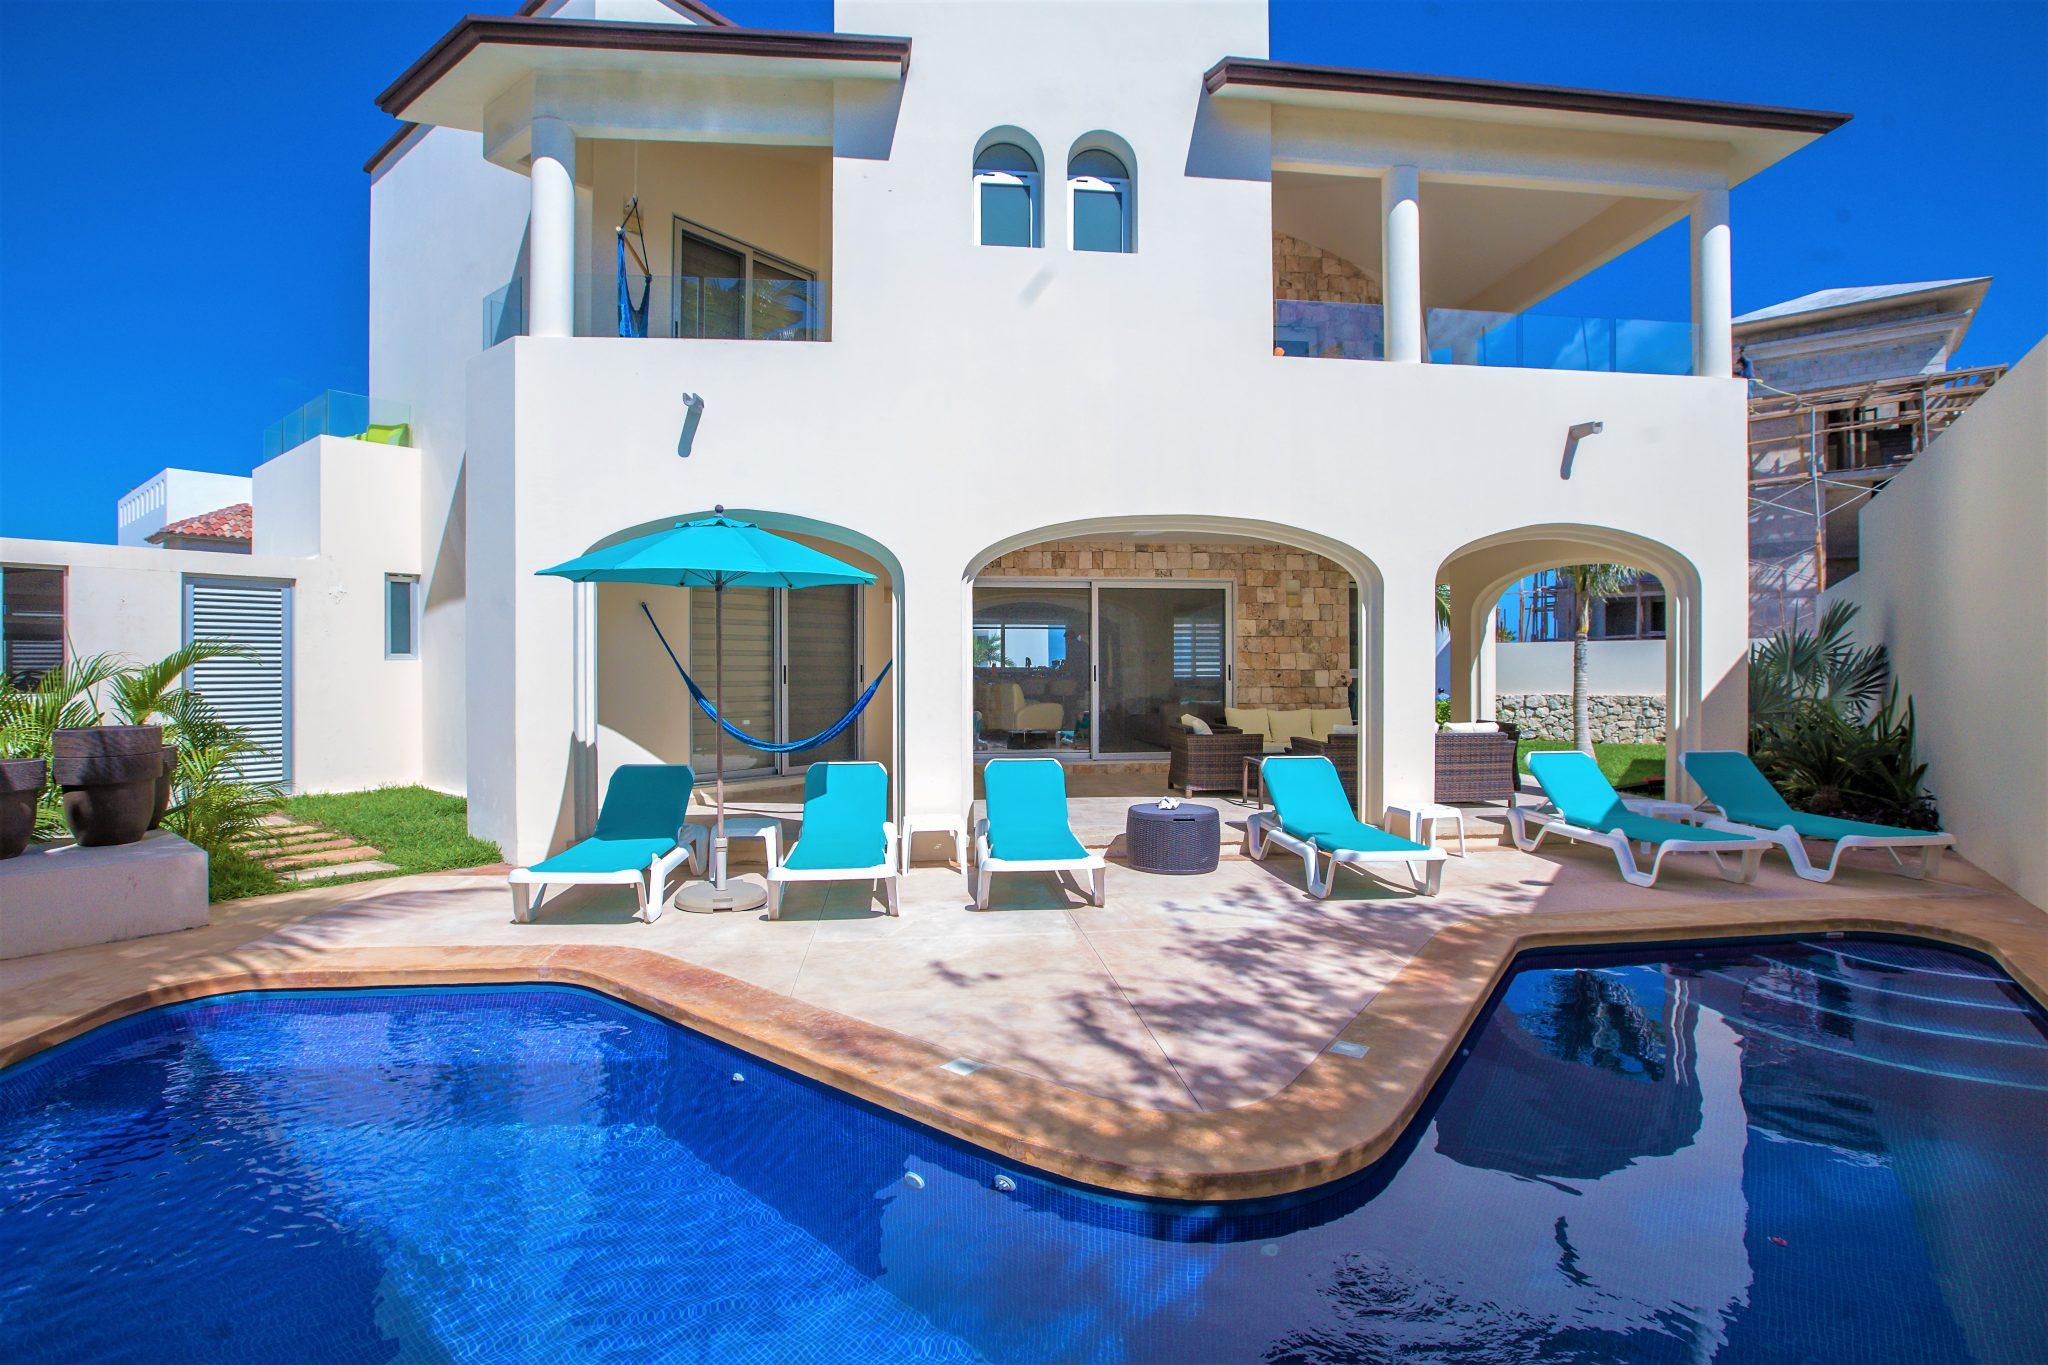 Casa Elegante luxury vacation rental home on Isla Mujeres